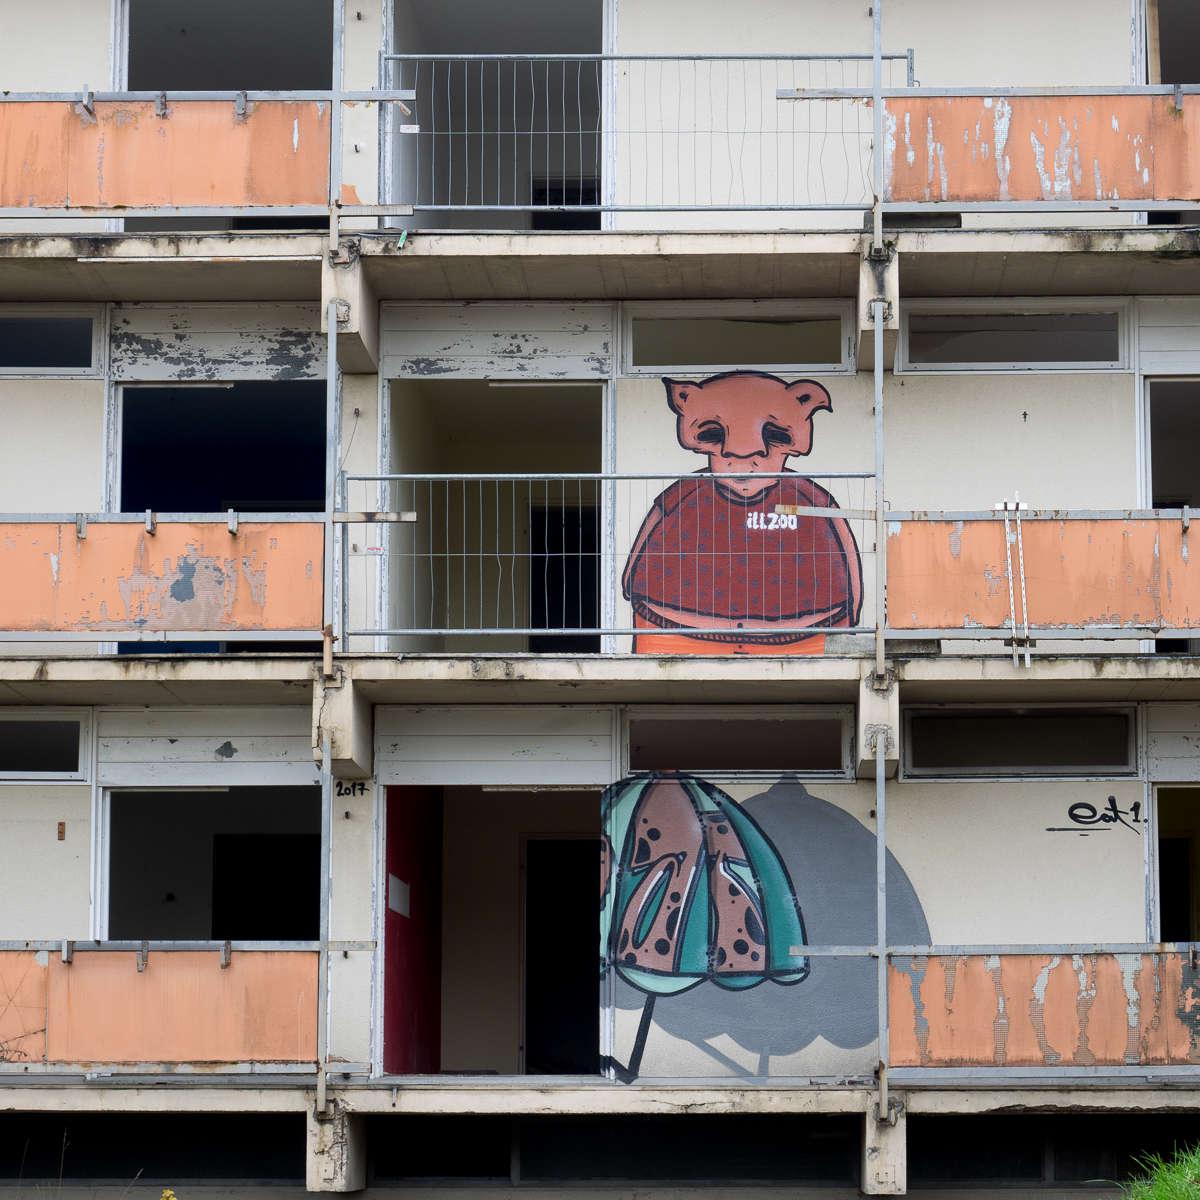 Ruheorte & Graffiti - Am Krankenhaus in Langen